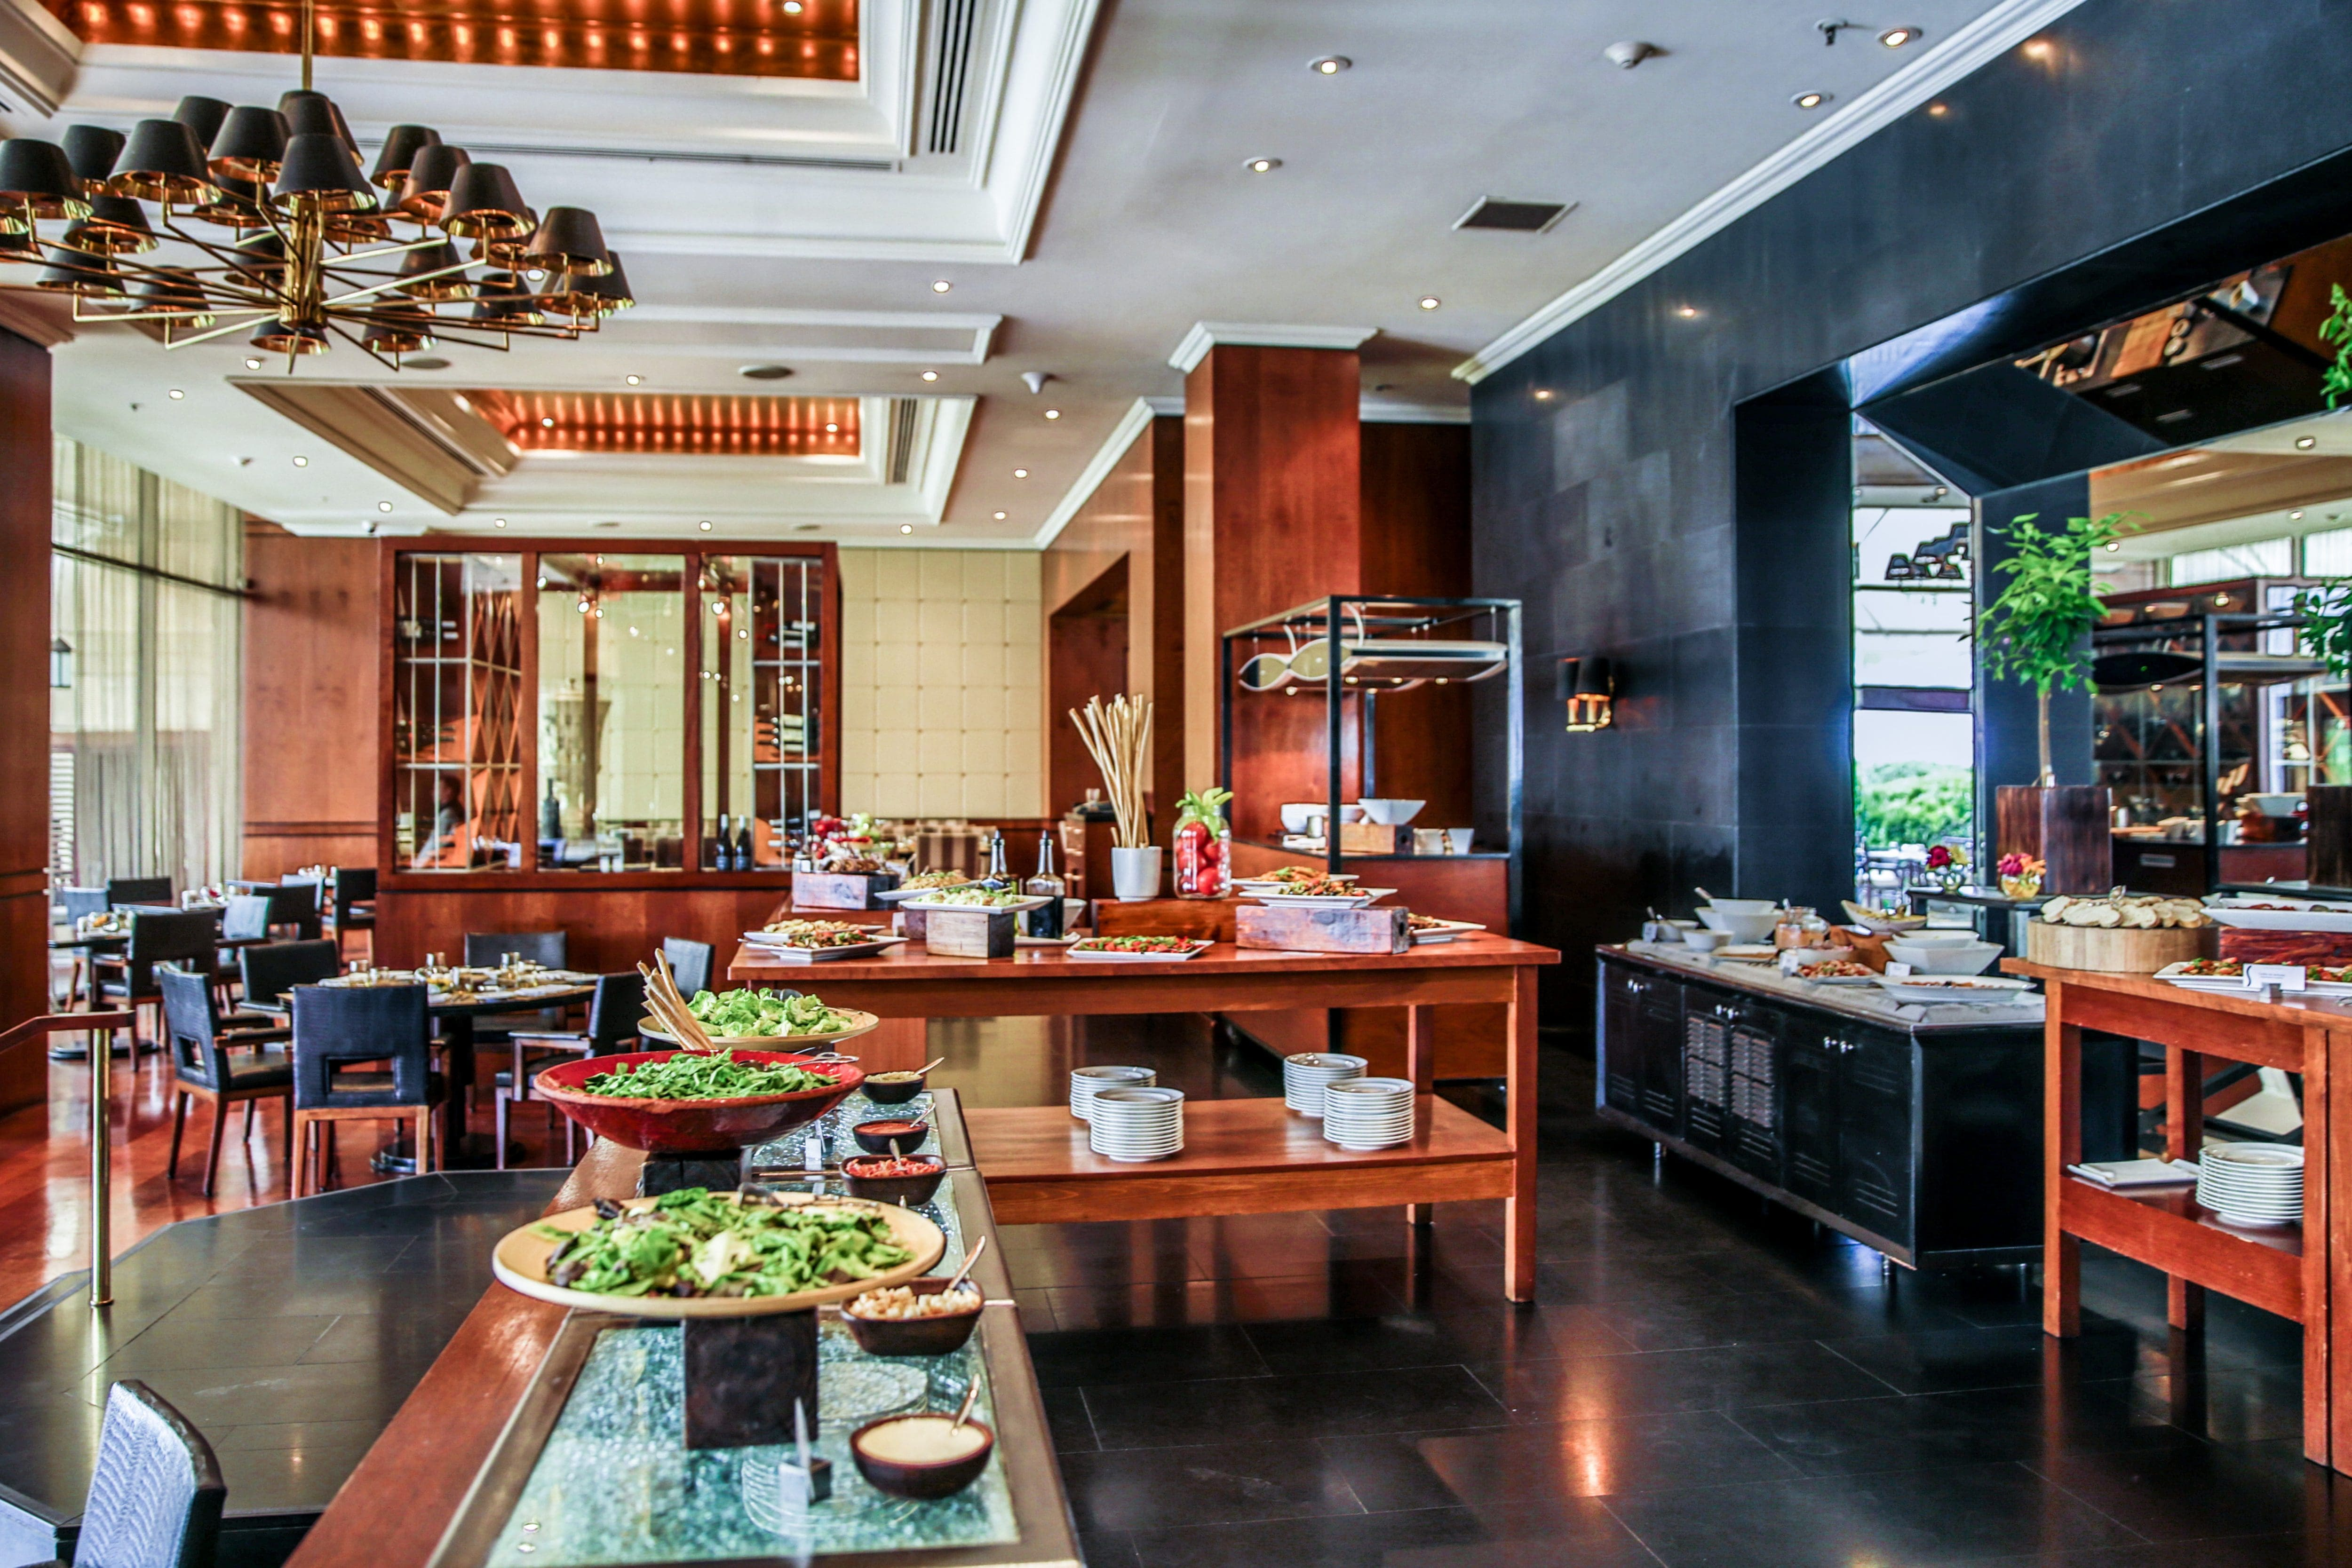 Plates of food on display in Senso restaurant at Mandarin Oriental, Santiago